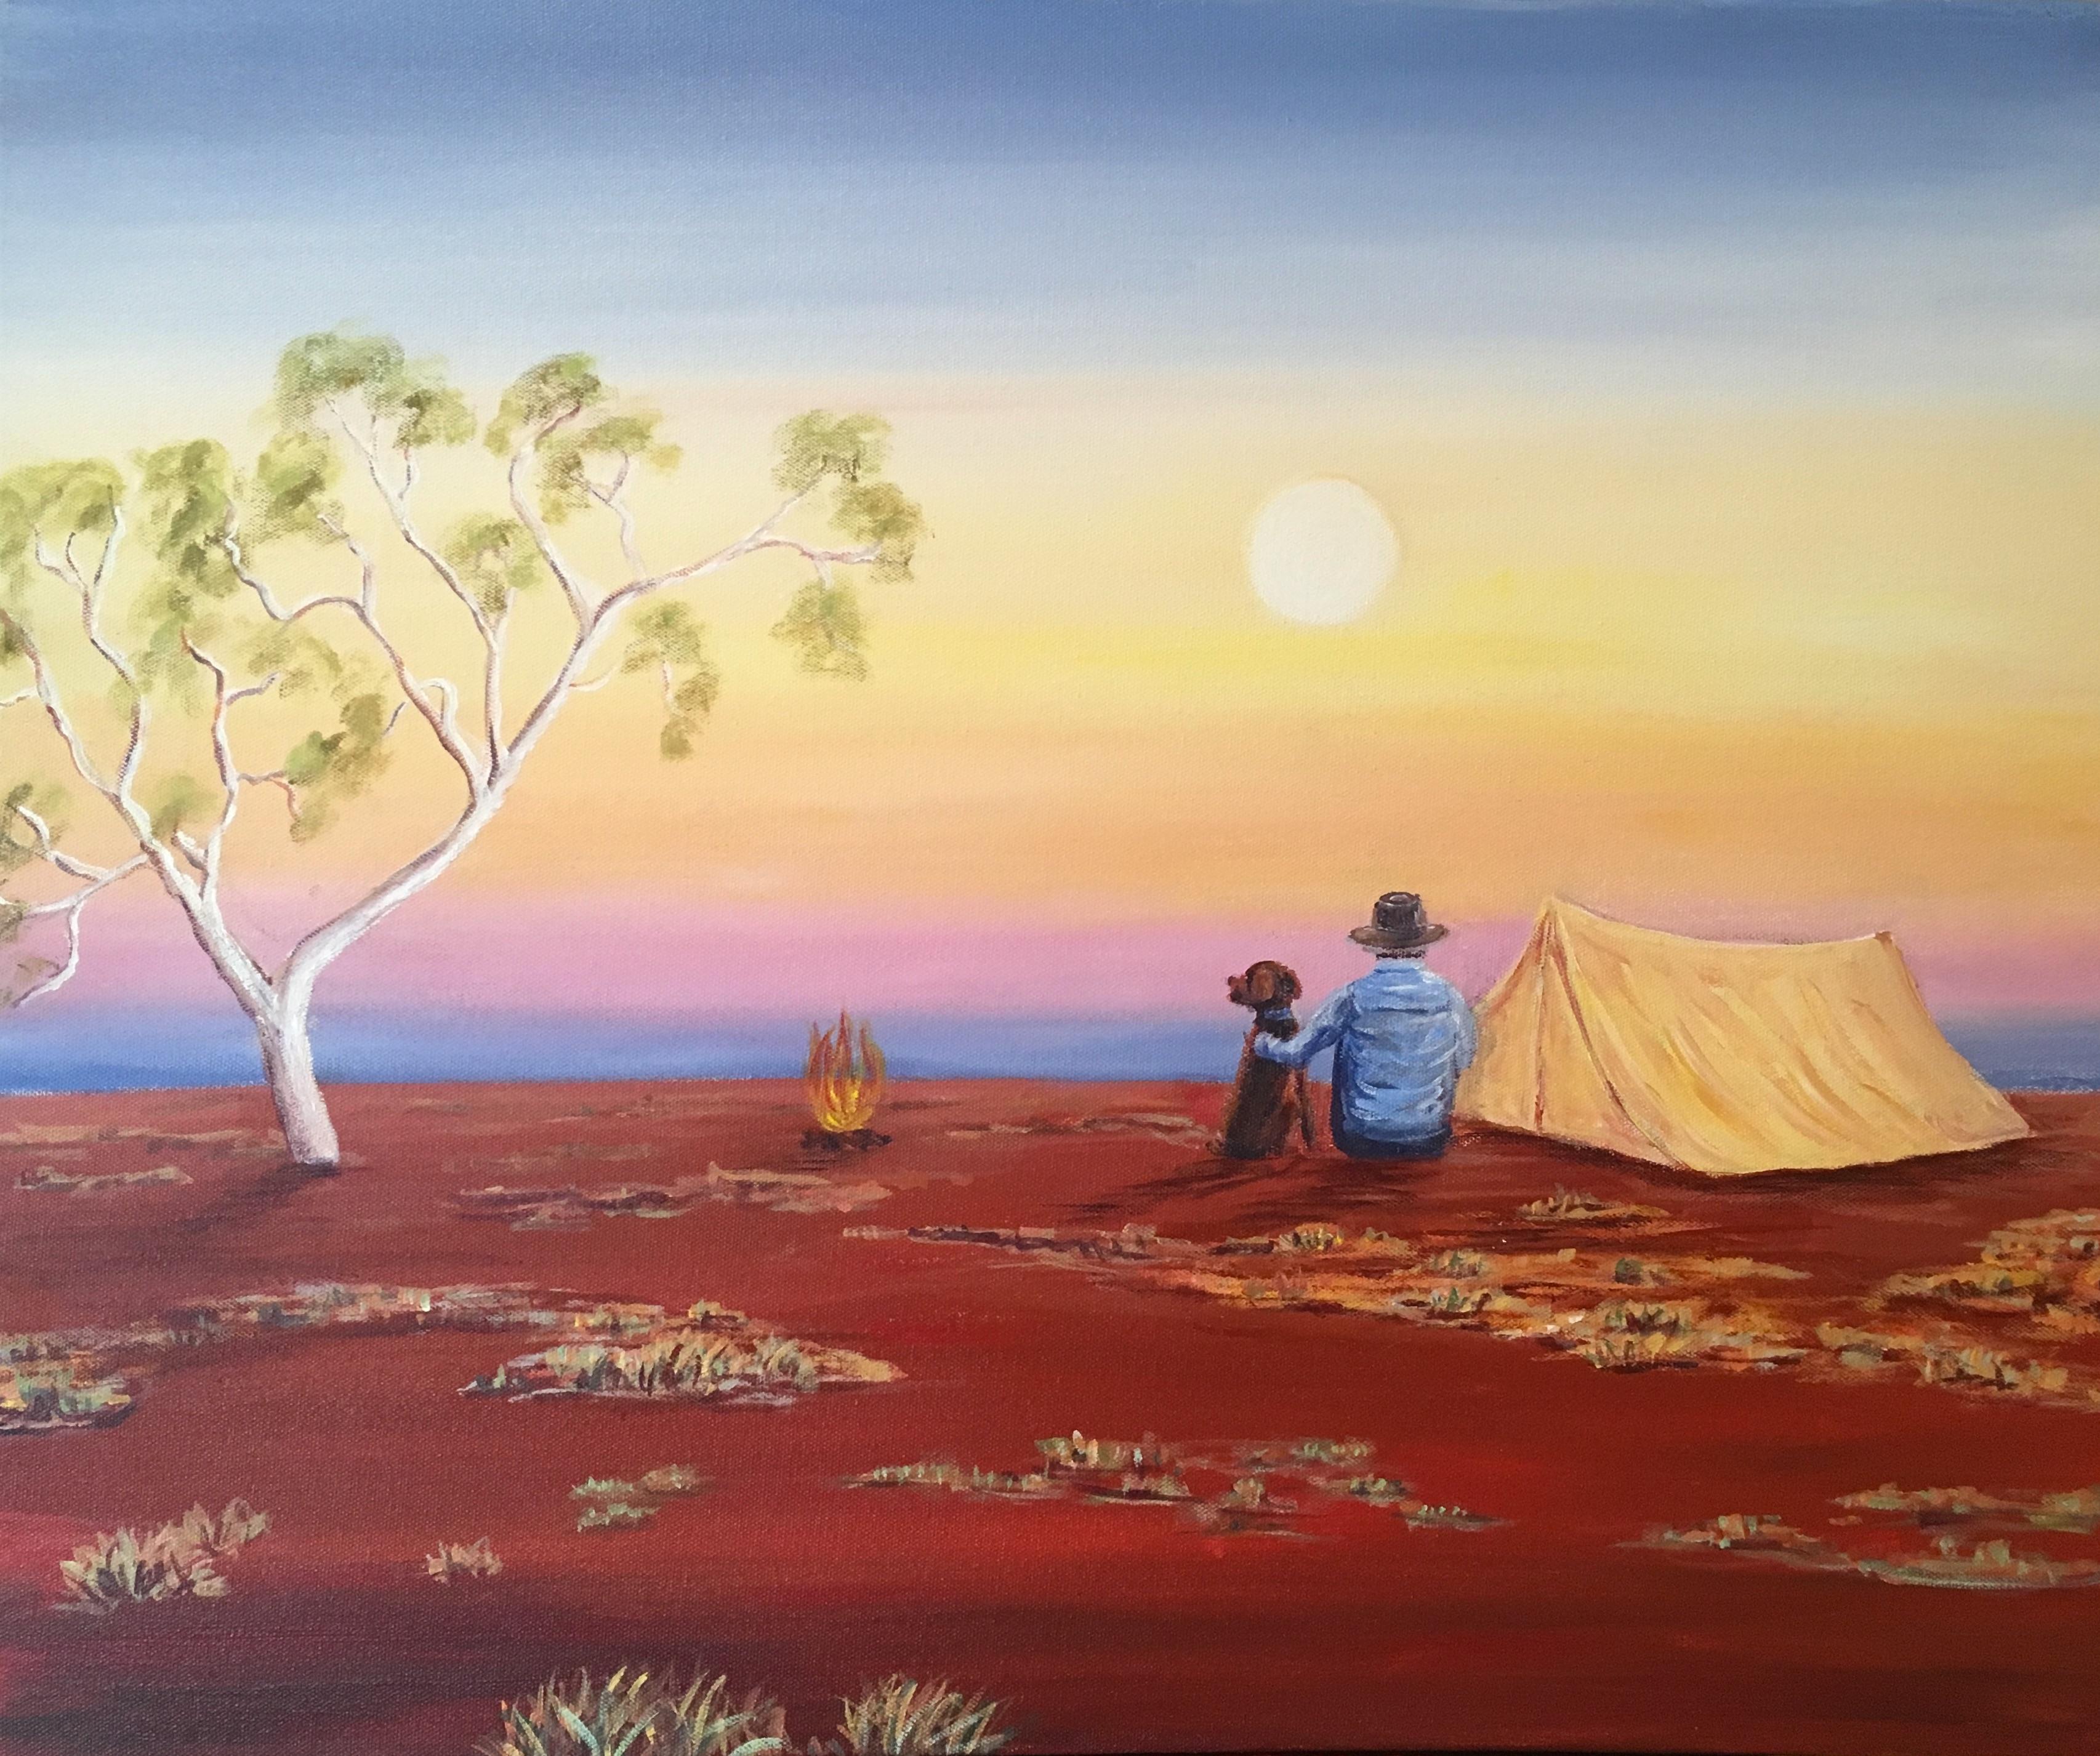 Pilbara camping